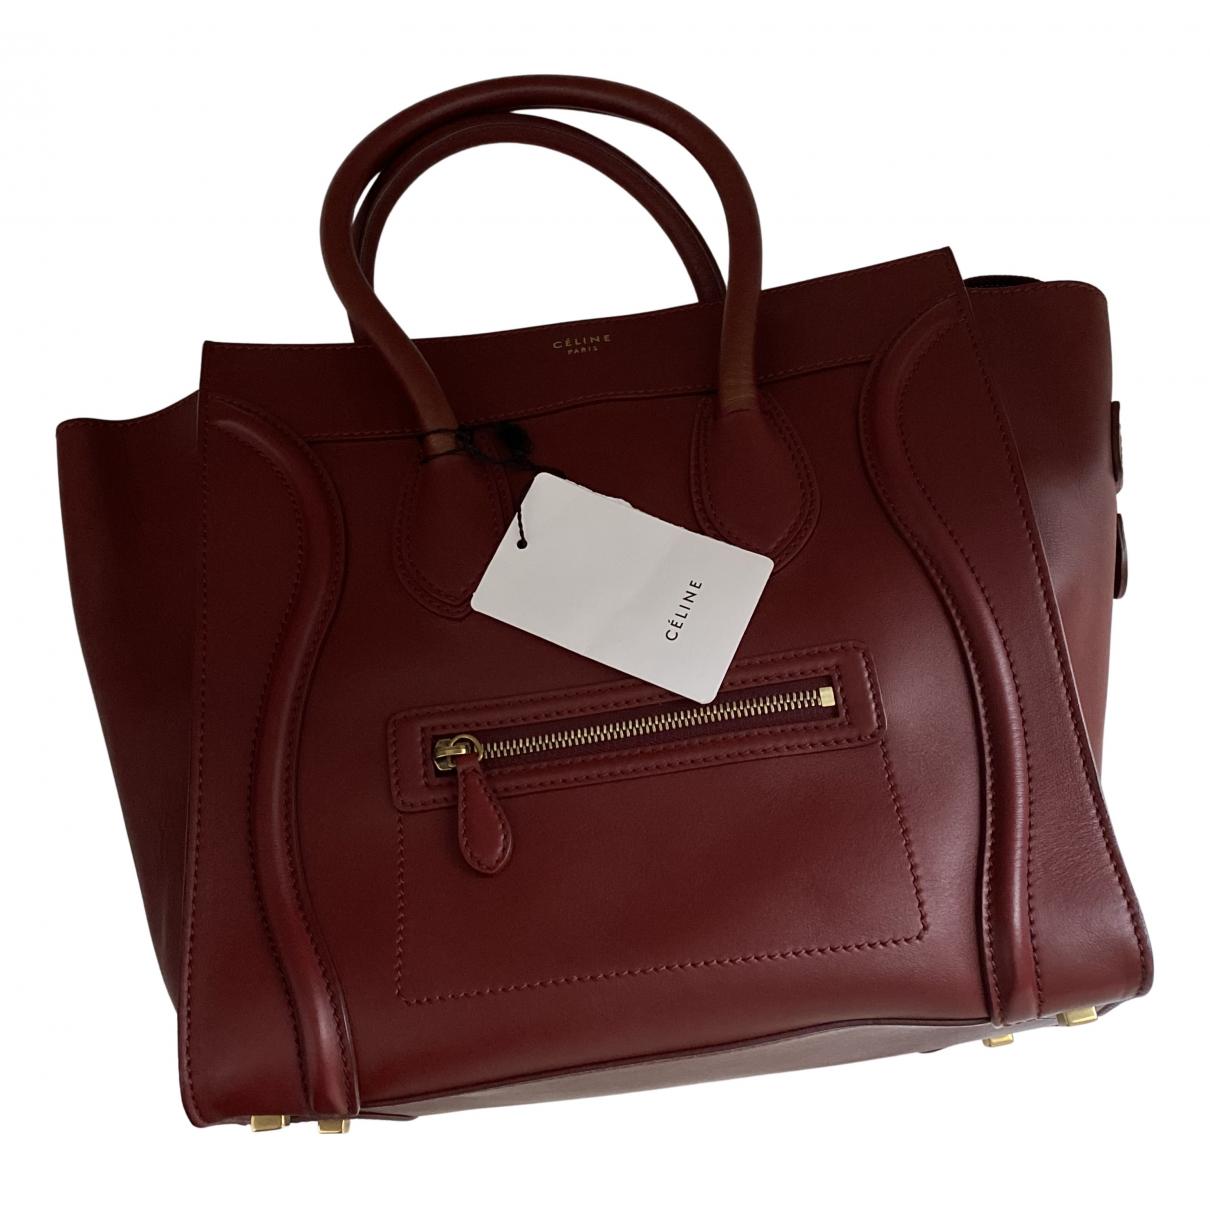 Celine Luggage Phantom Burgundy Leather handbag for Women N